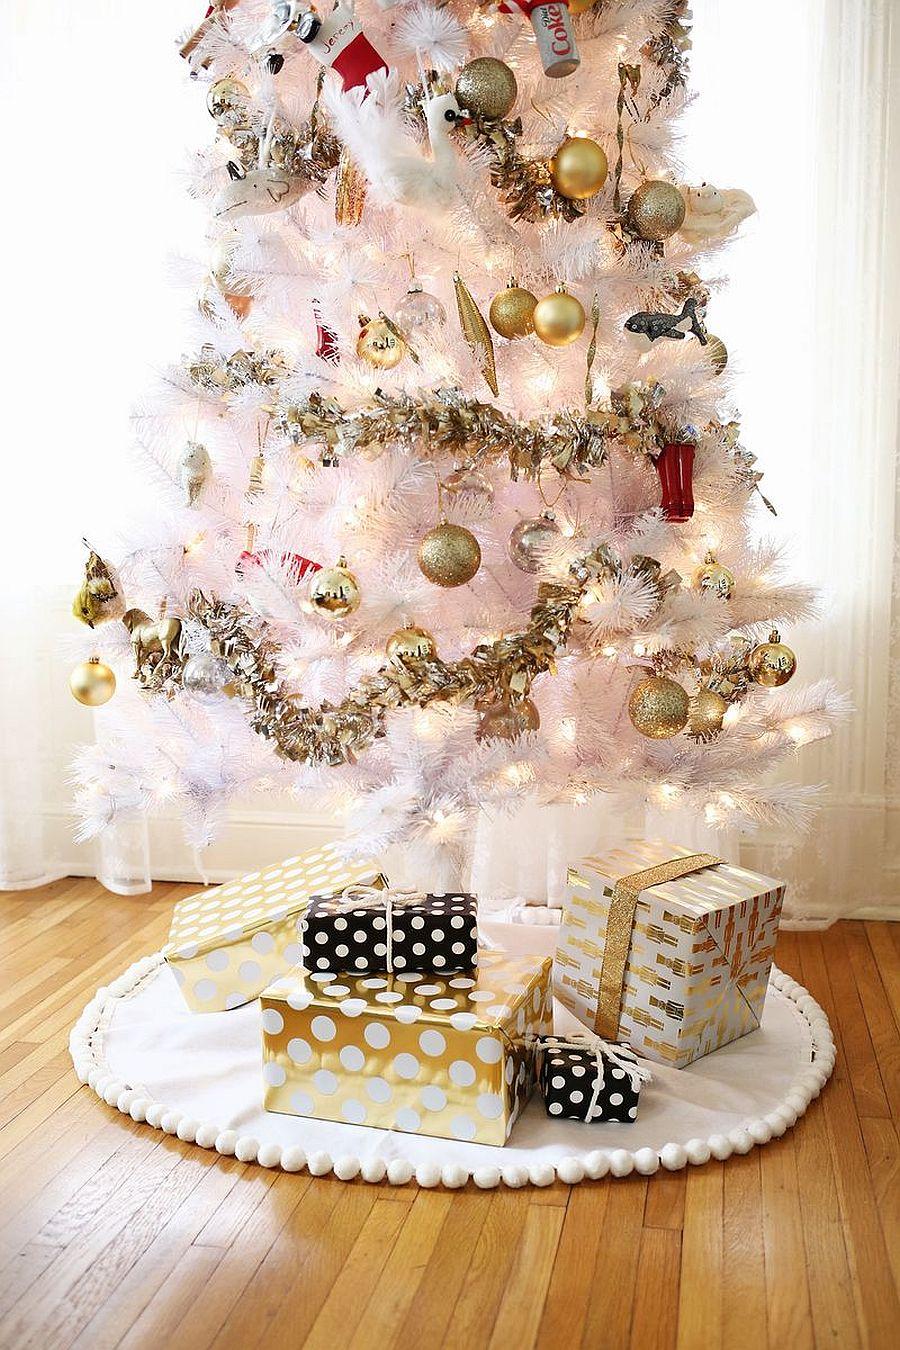 30 affordable and easy diy christmas decorations. Black Bedroom Furniture Sets. Home Design Ideas